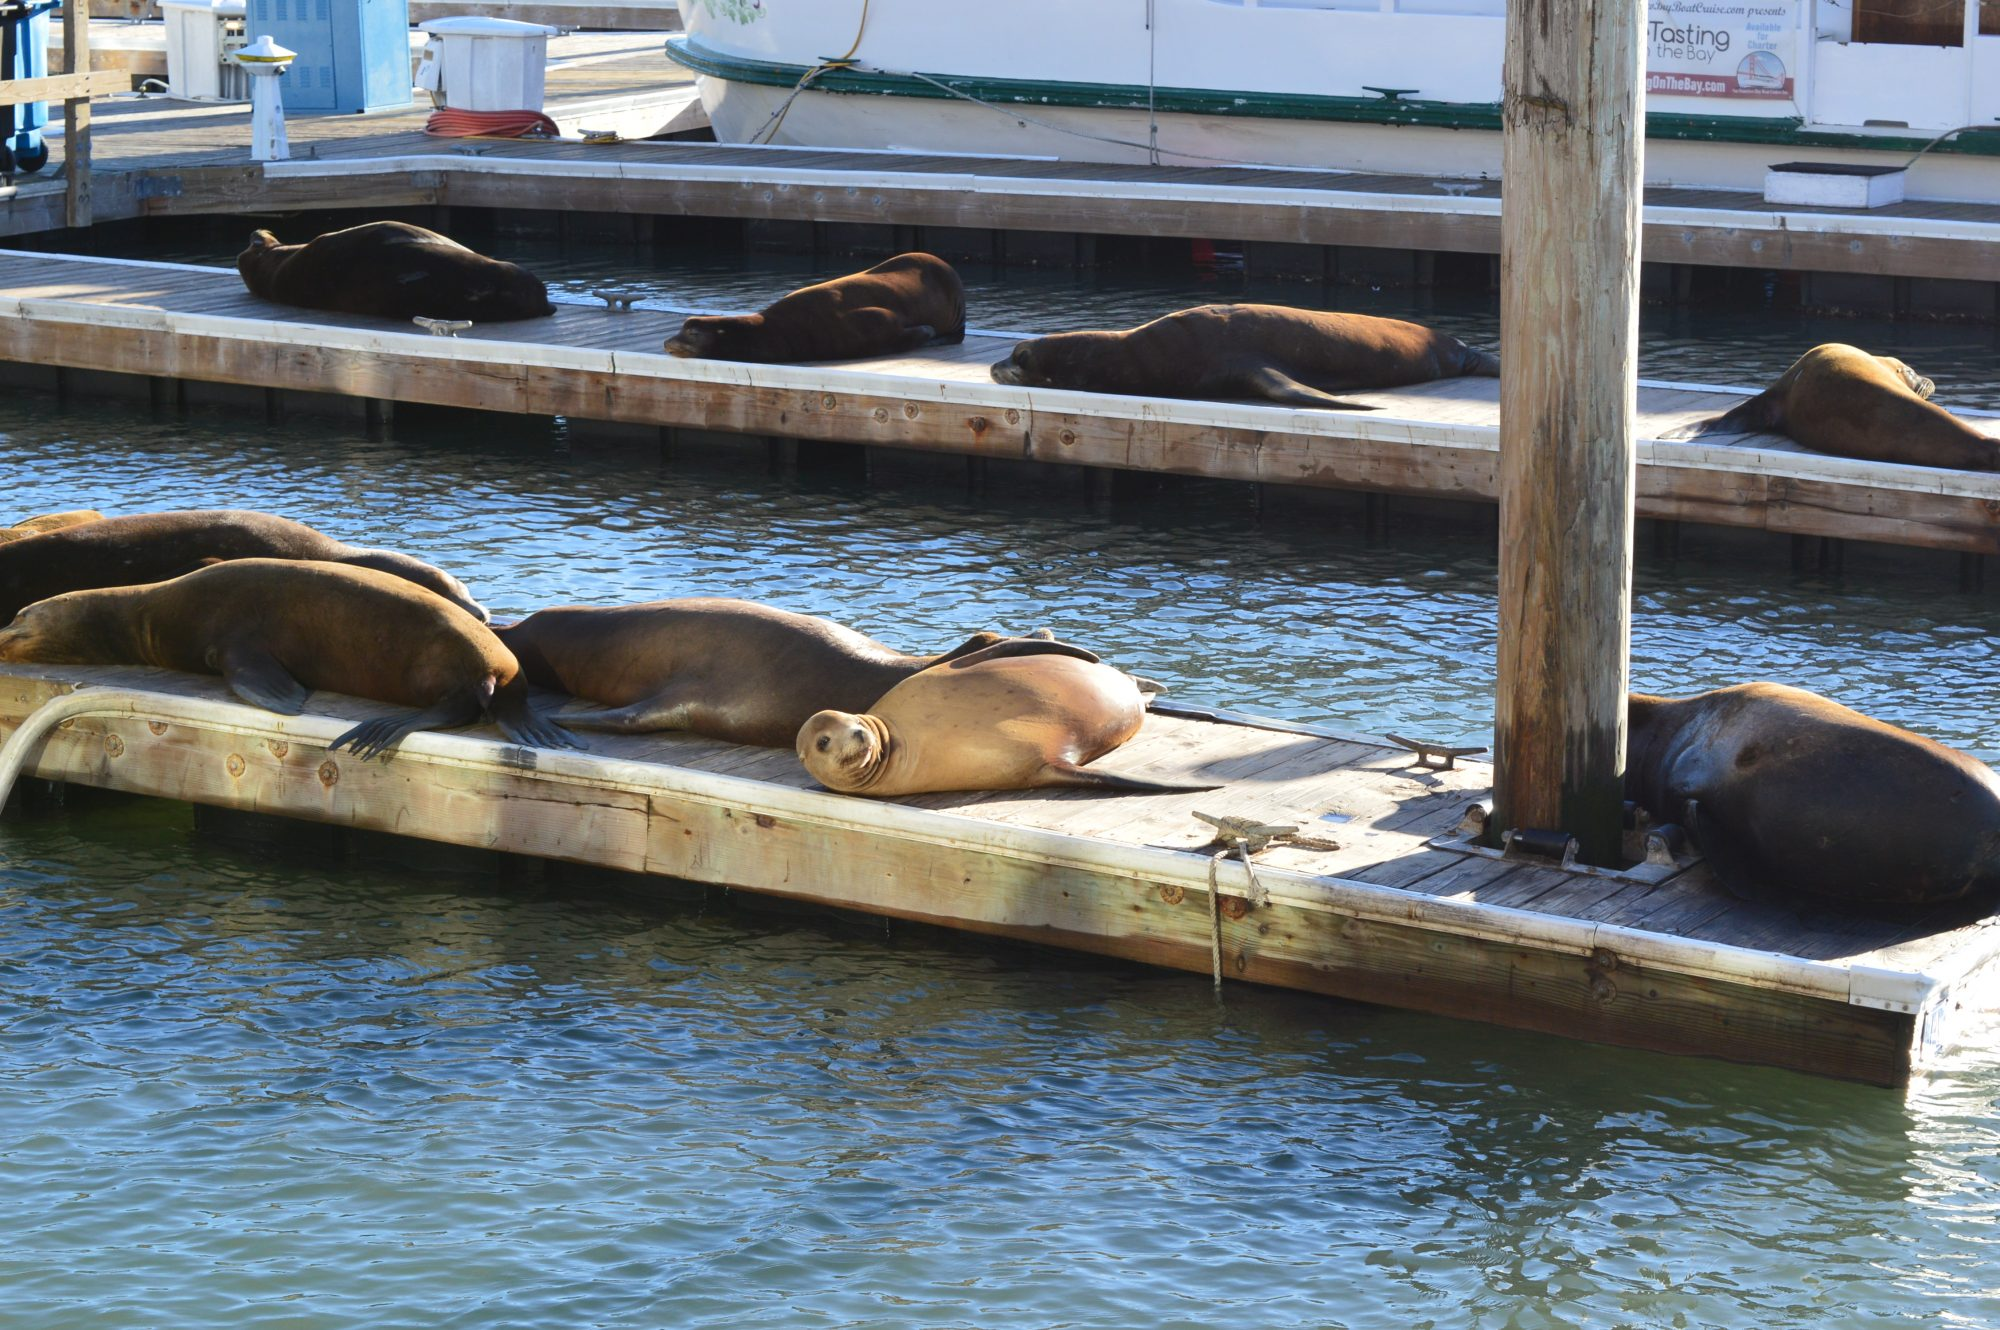 Sea lions at Pier 39 San Francisco